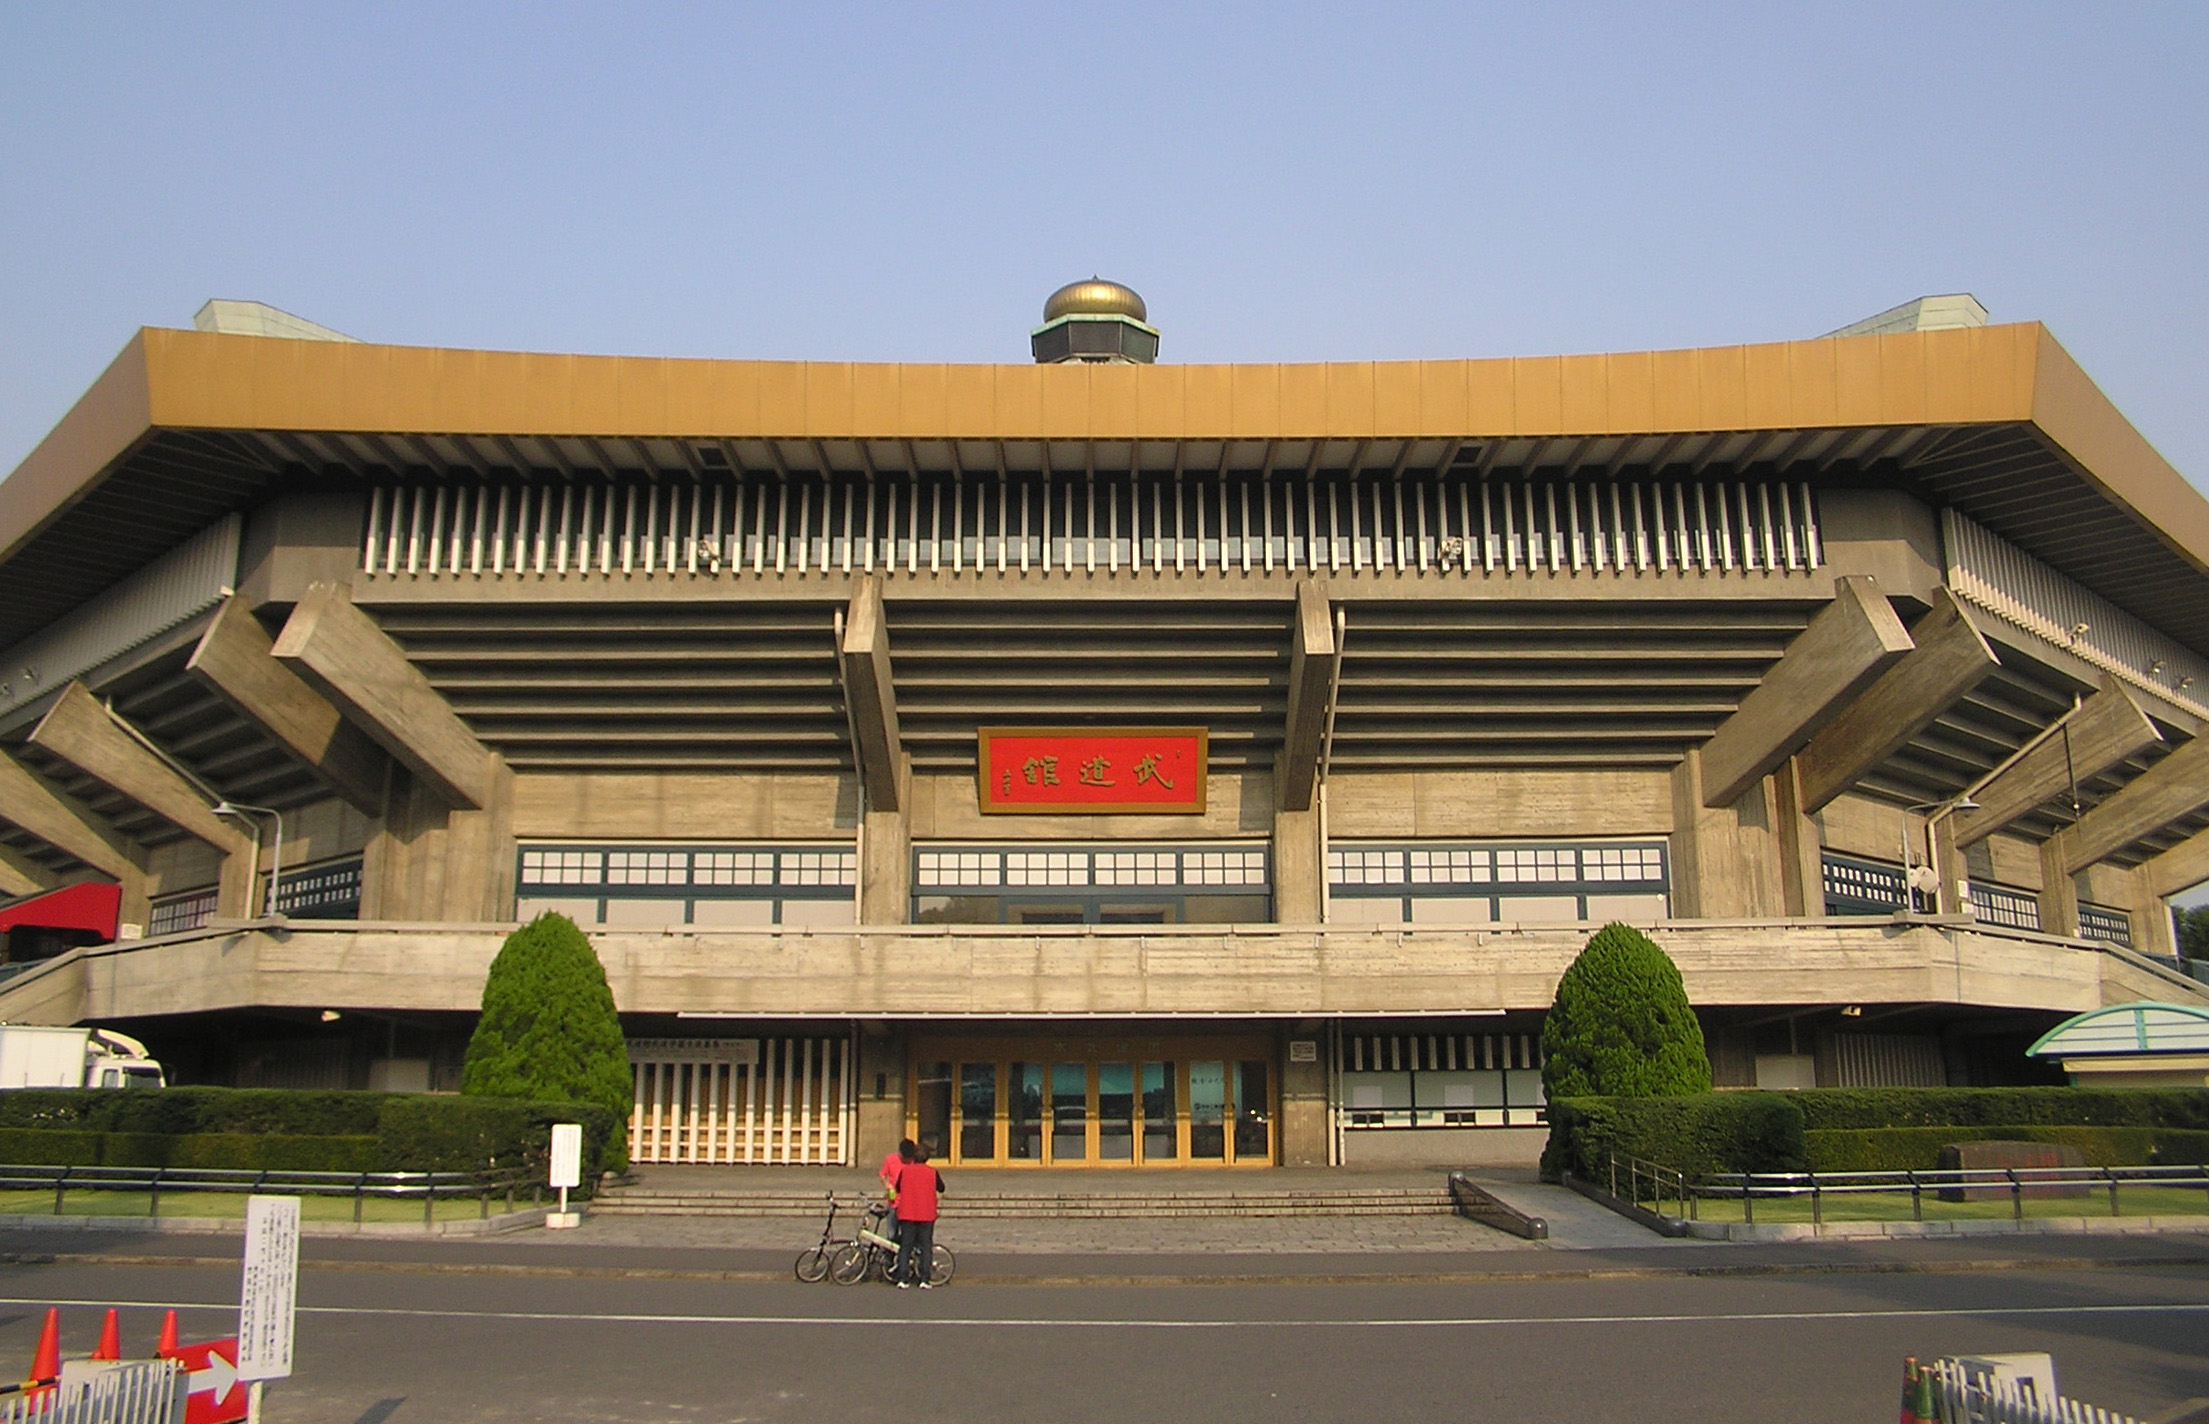 Nippon_Budokan_2_Kitanomaru_Chiyoda_Tokyo.jpg